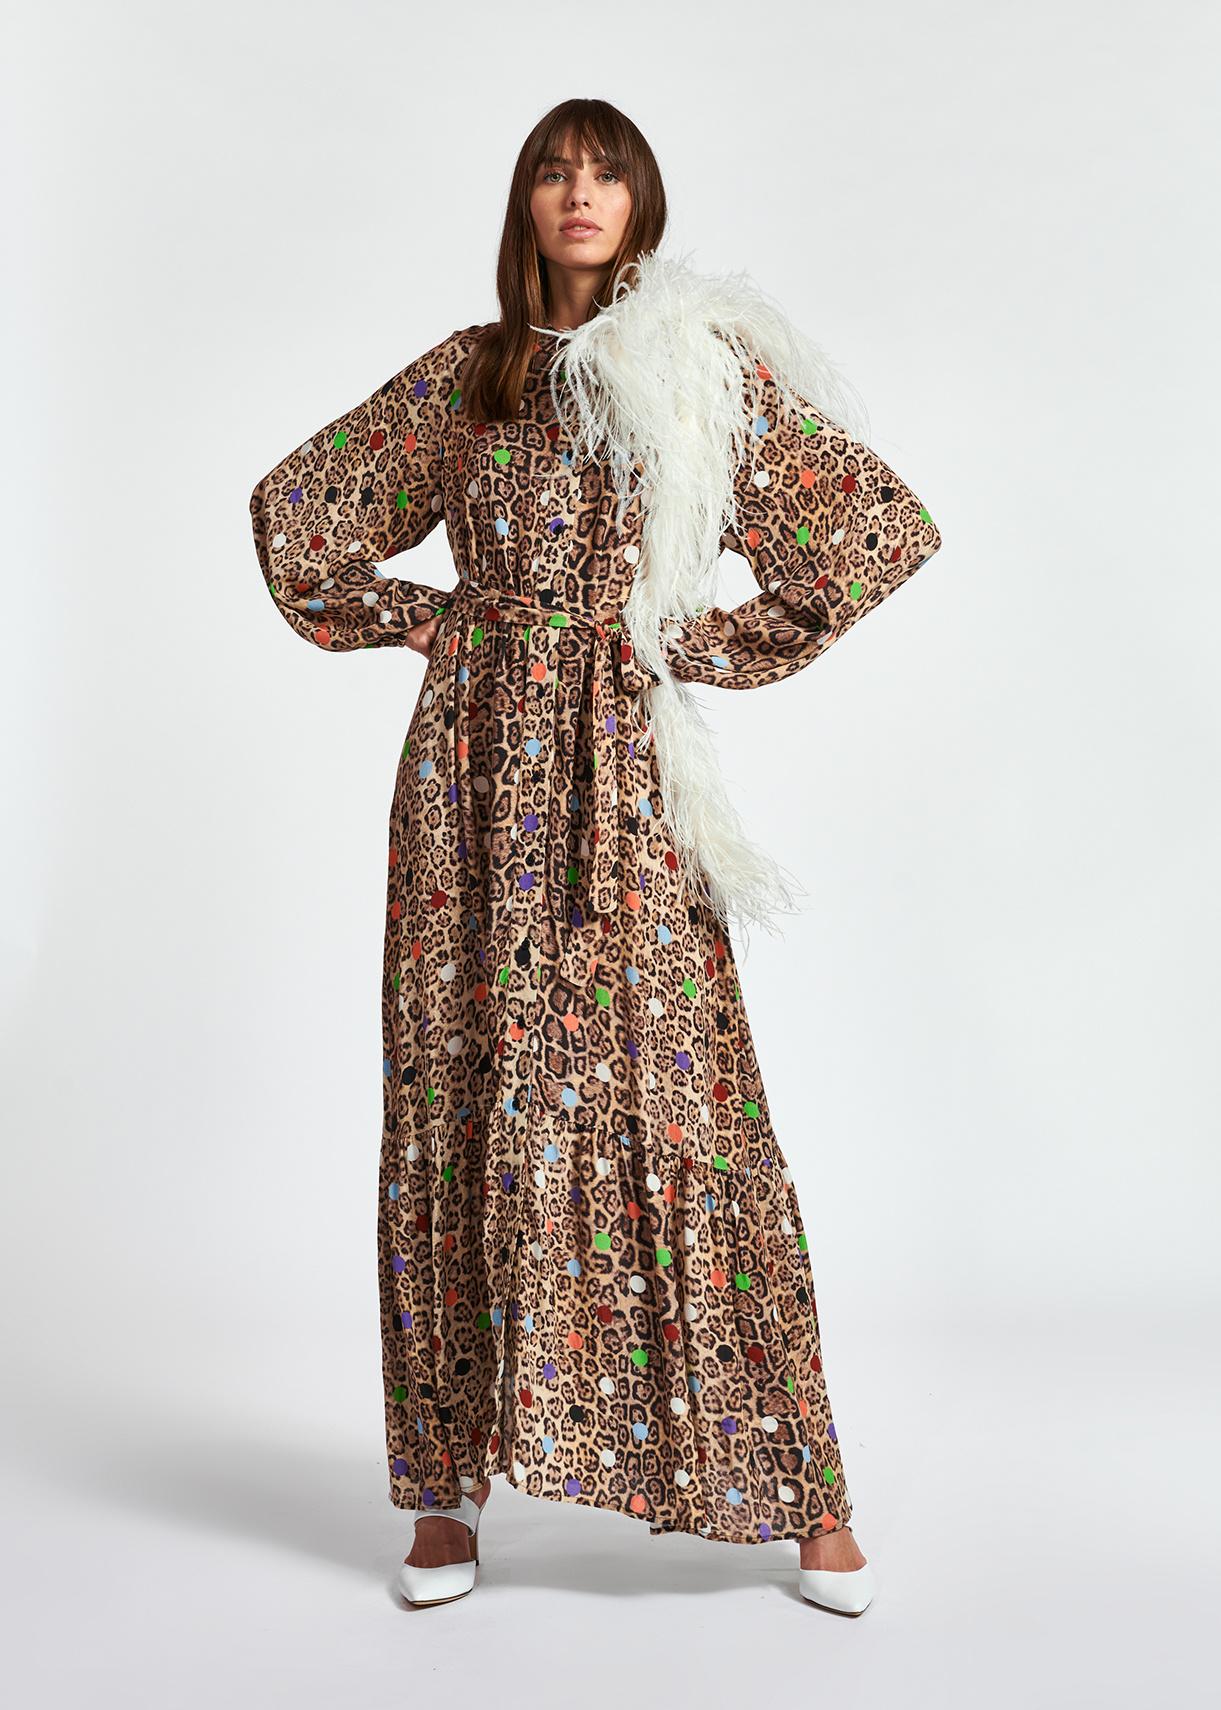 ZEBEL robe-3